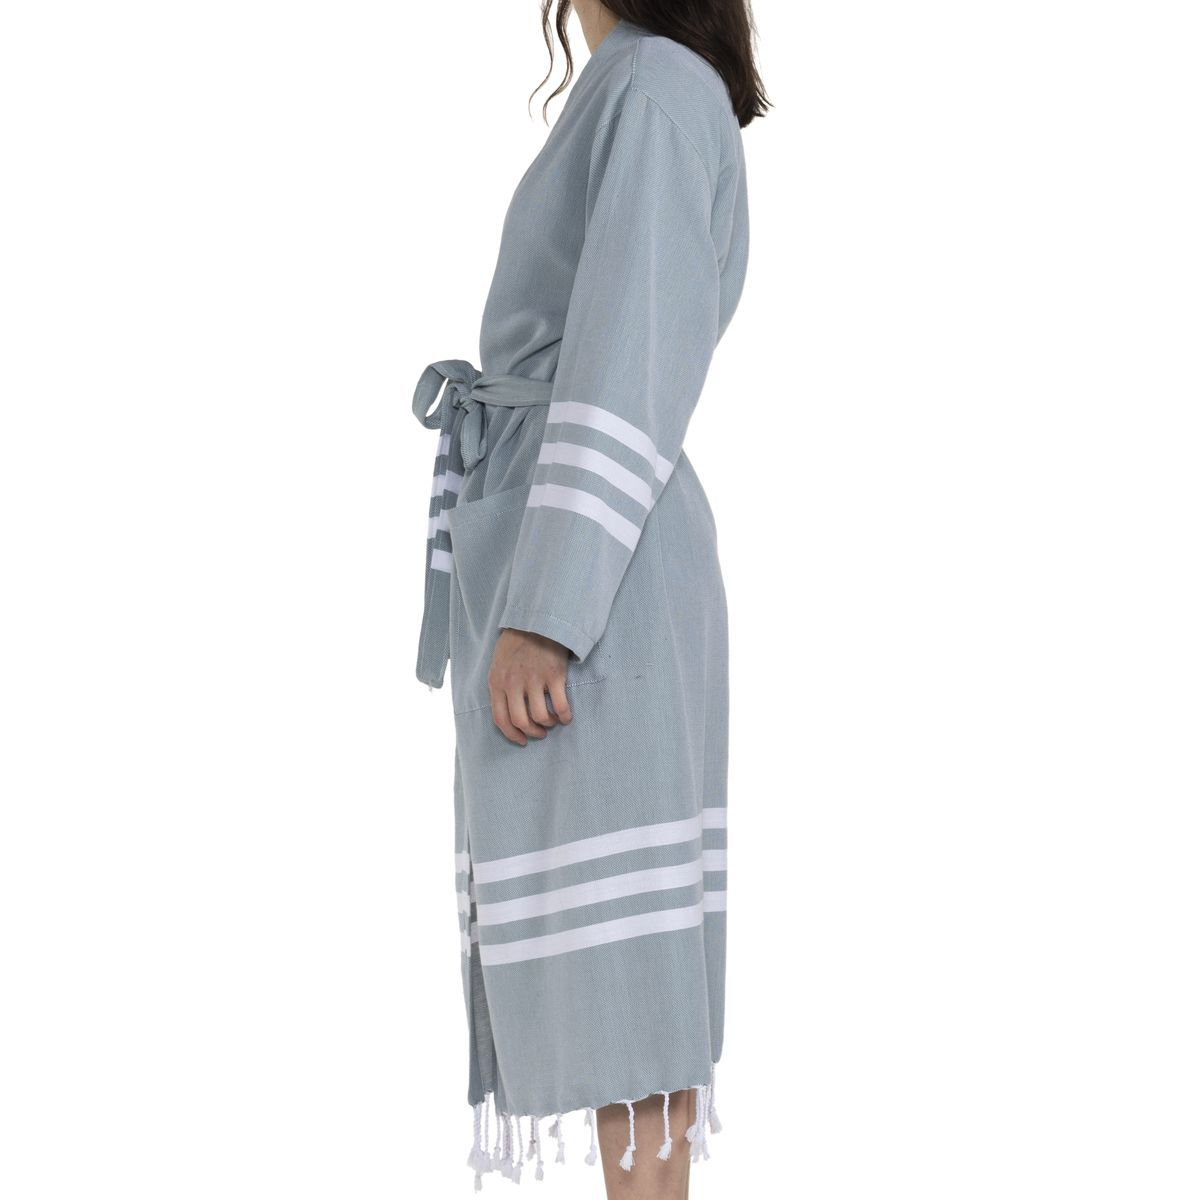 Bathrobe Bala Sultan kimono - Almond Green